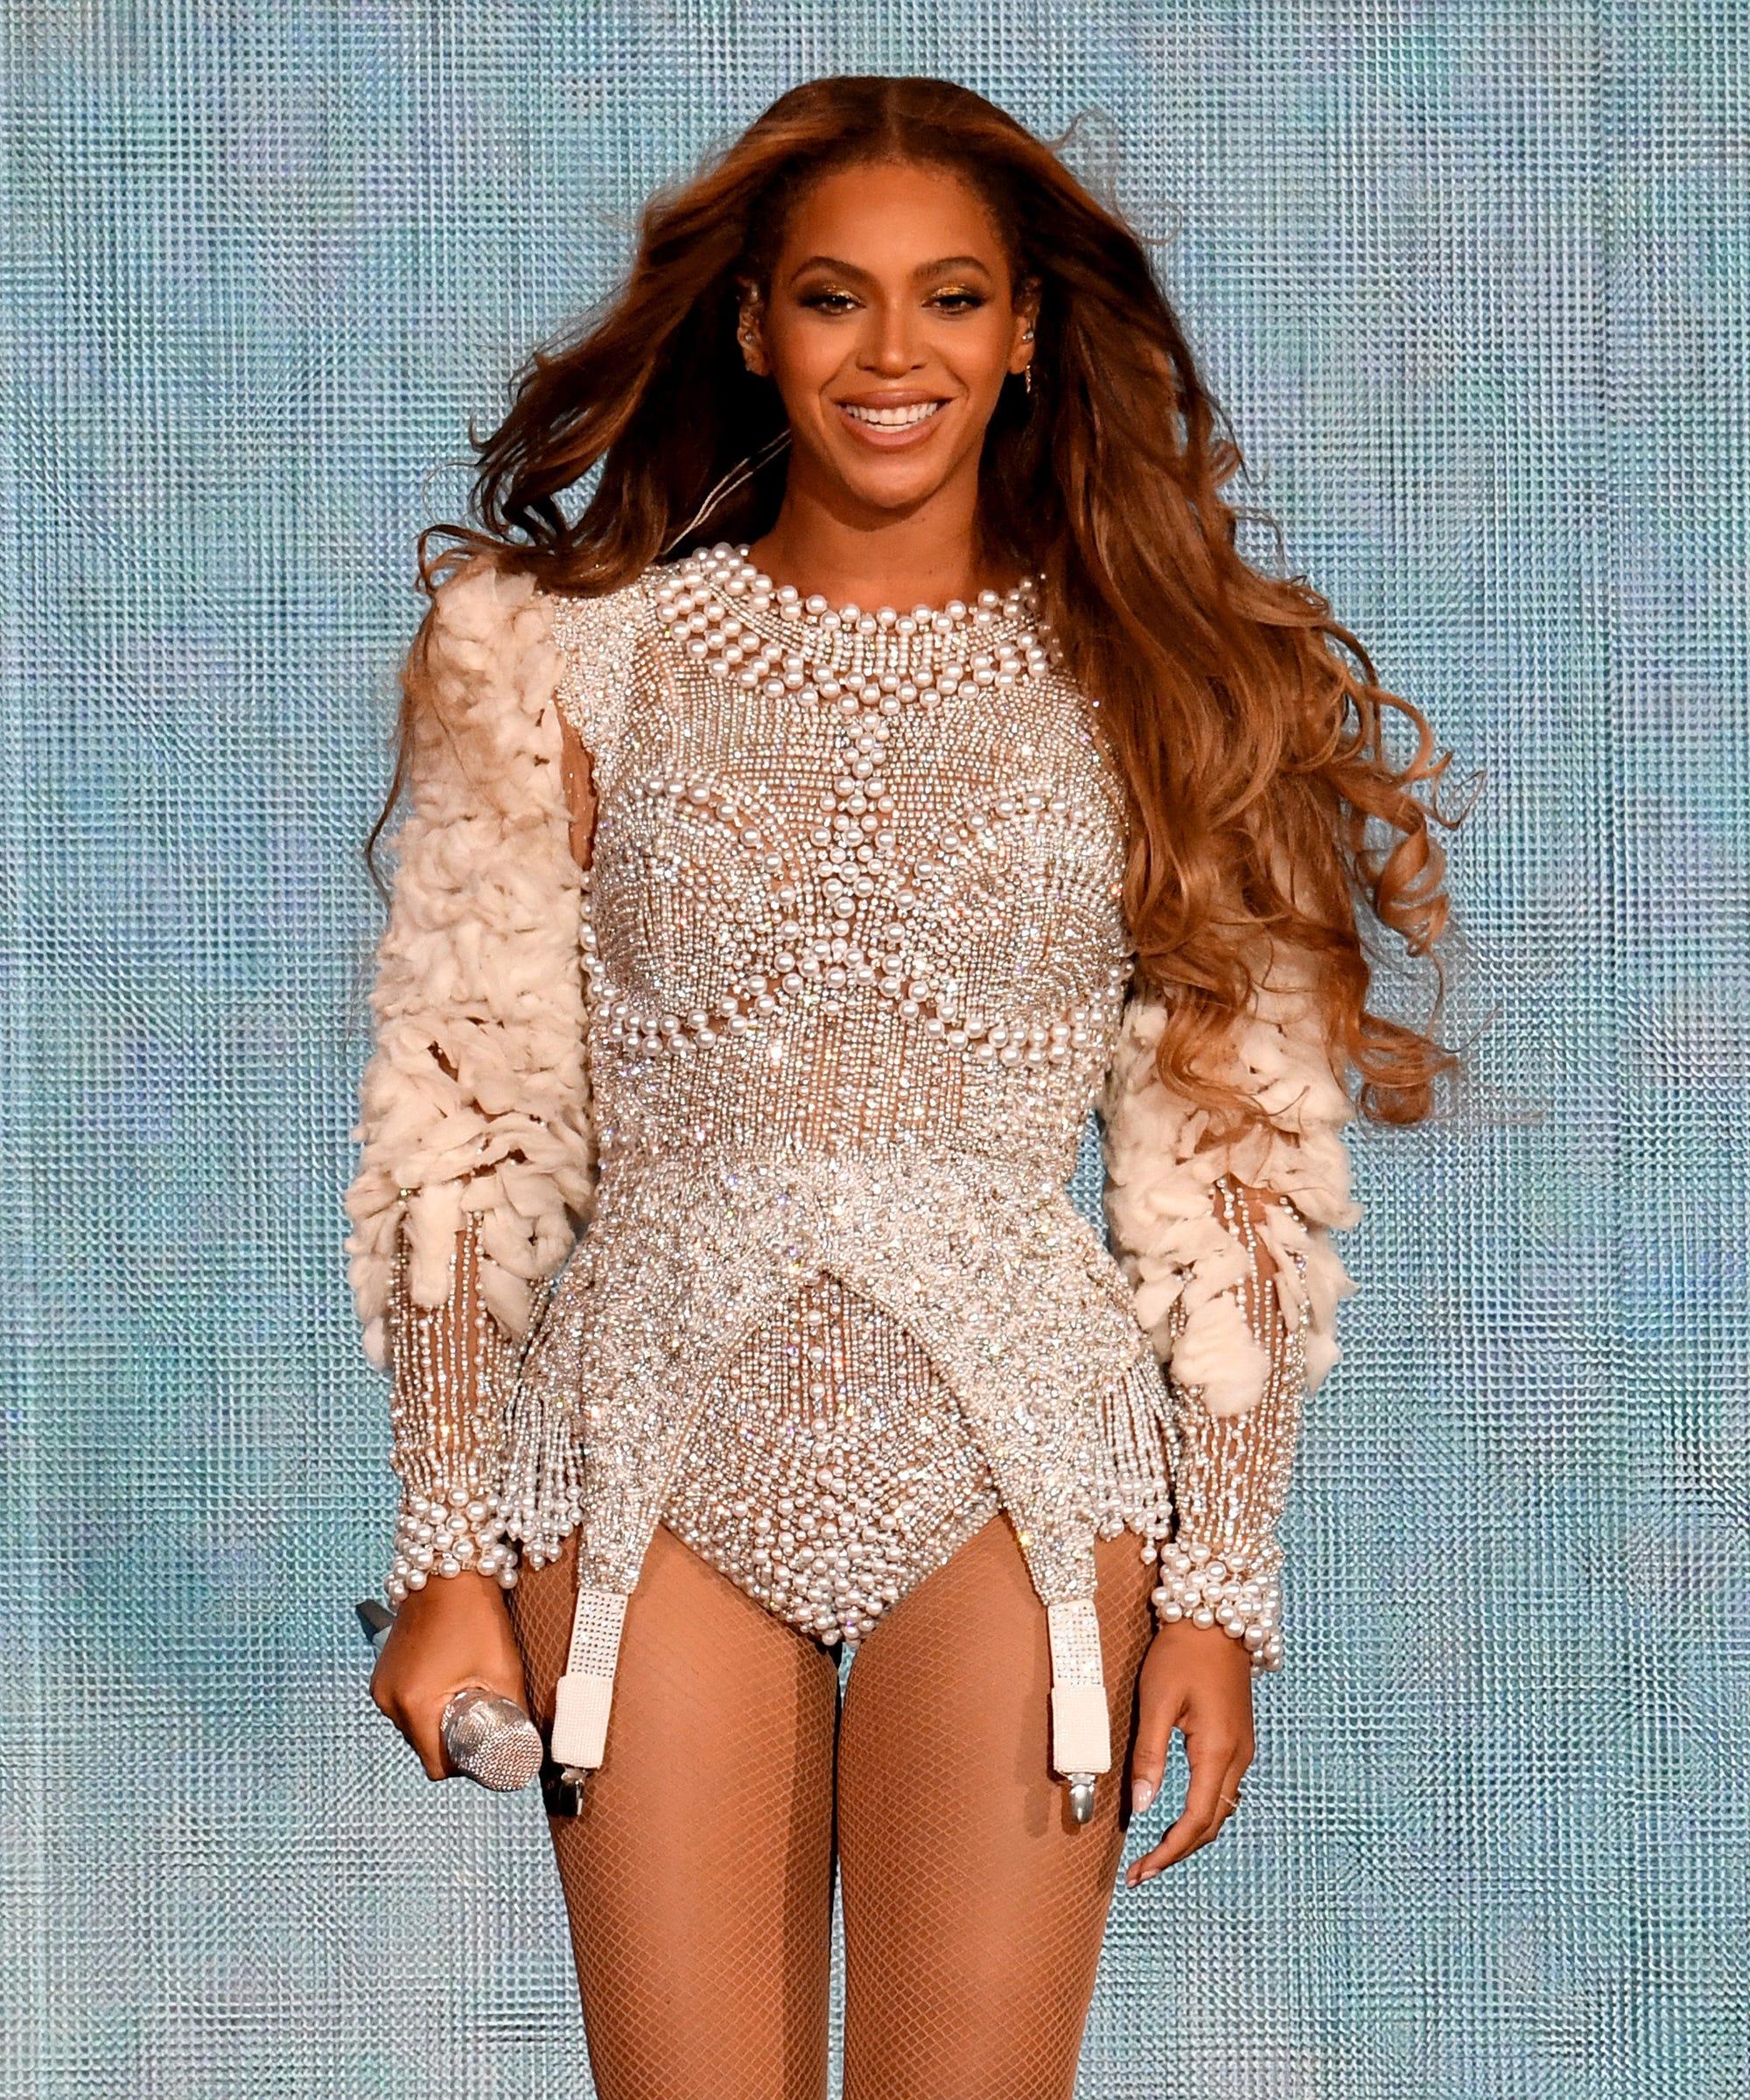 840249831 Beyonce Public Desire Heels Get Confused For Yeezys